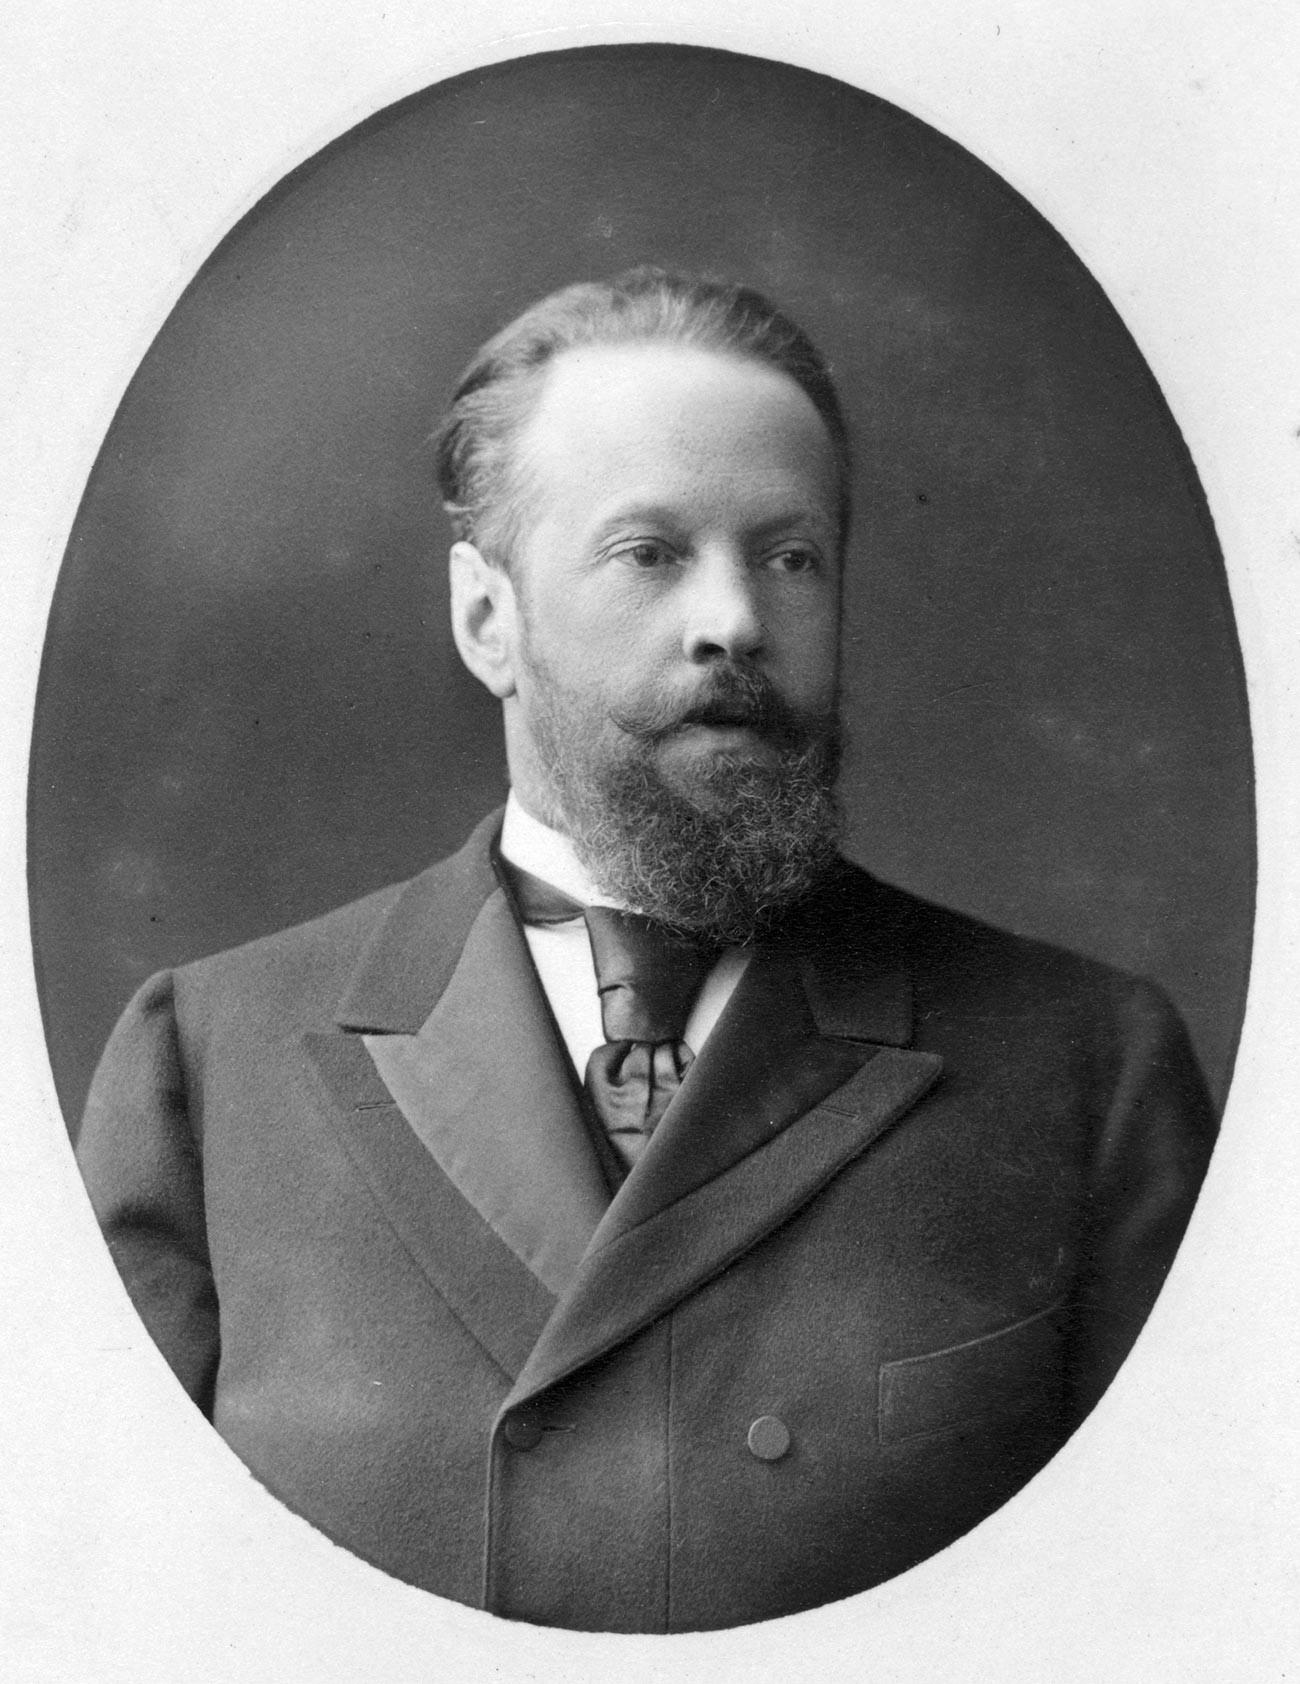 Sergey Witte, pria yang memperkenalkan podstakannik di kereta api Rusia.